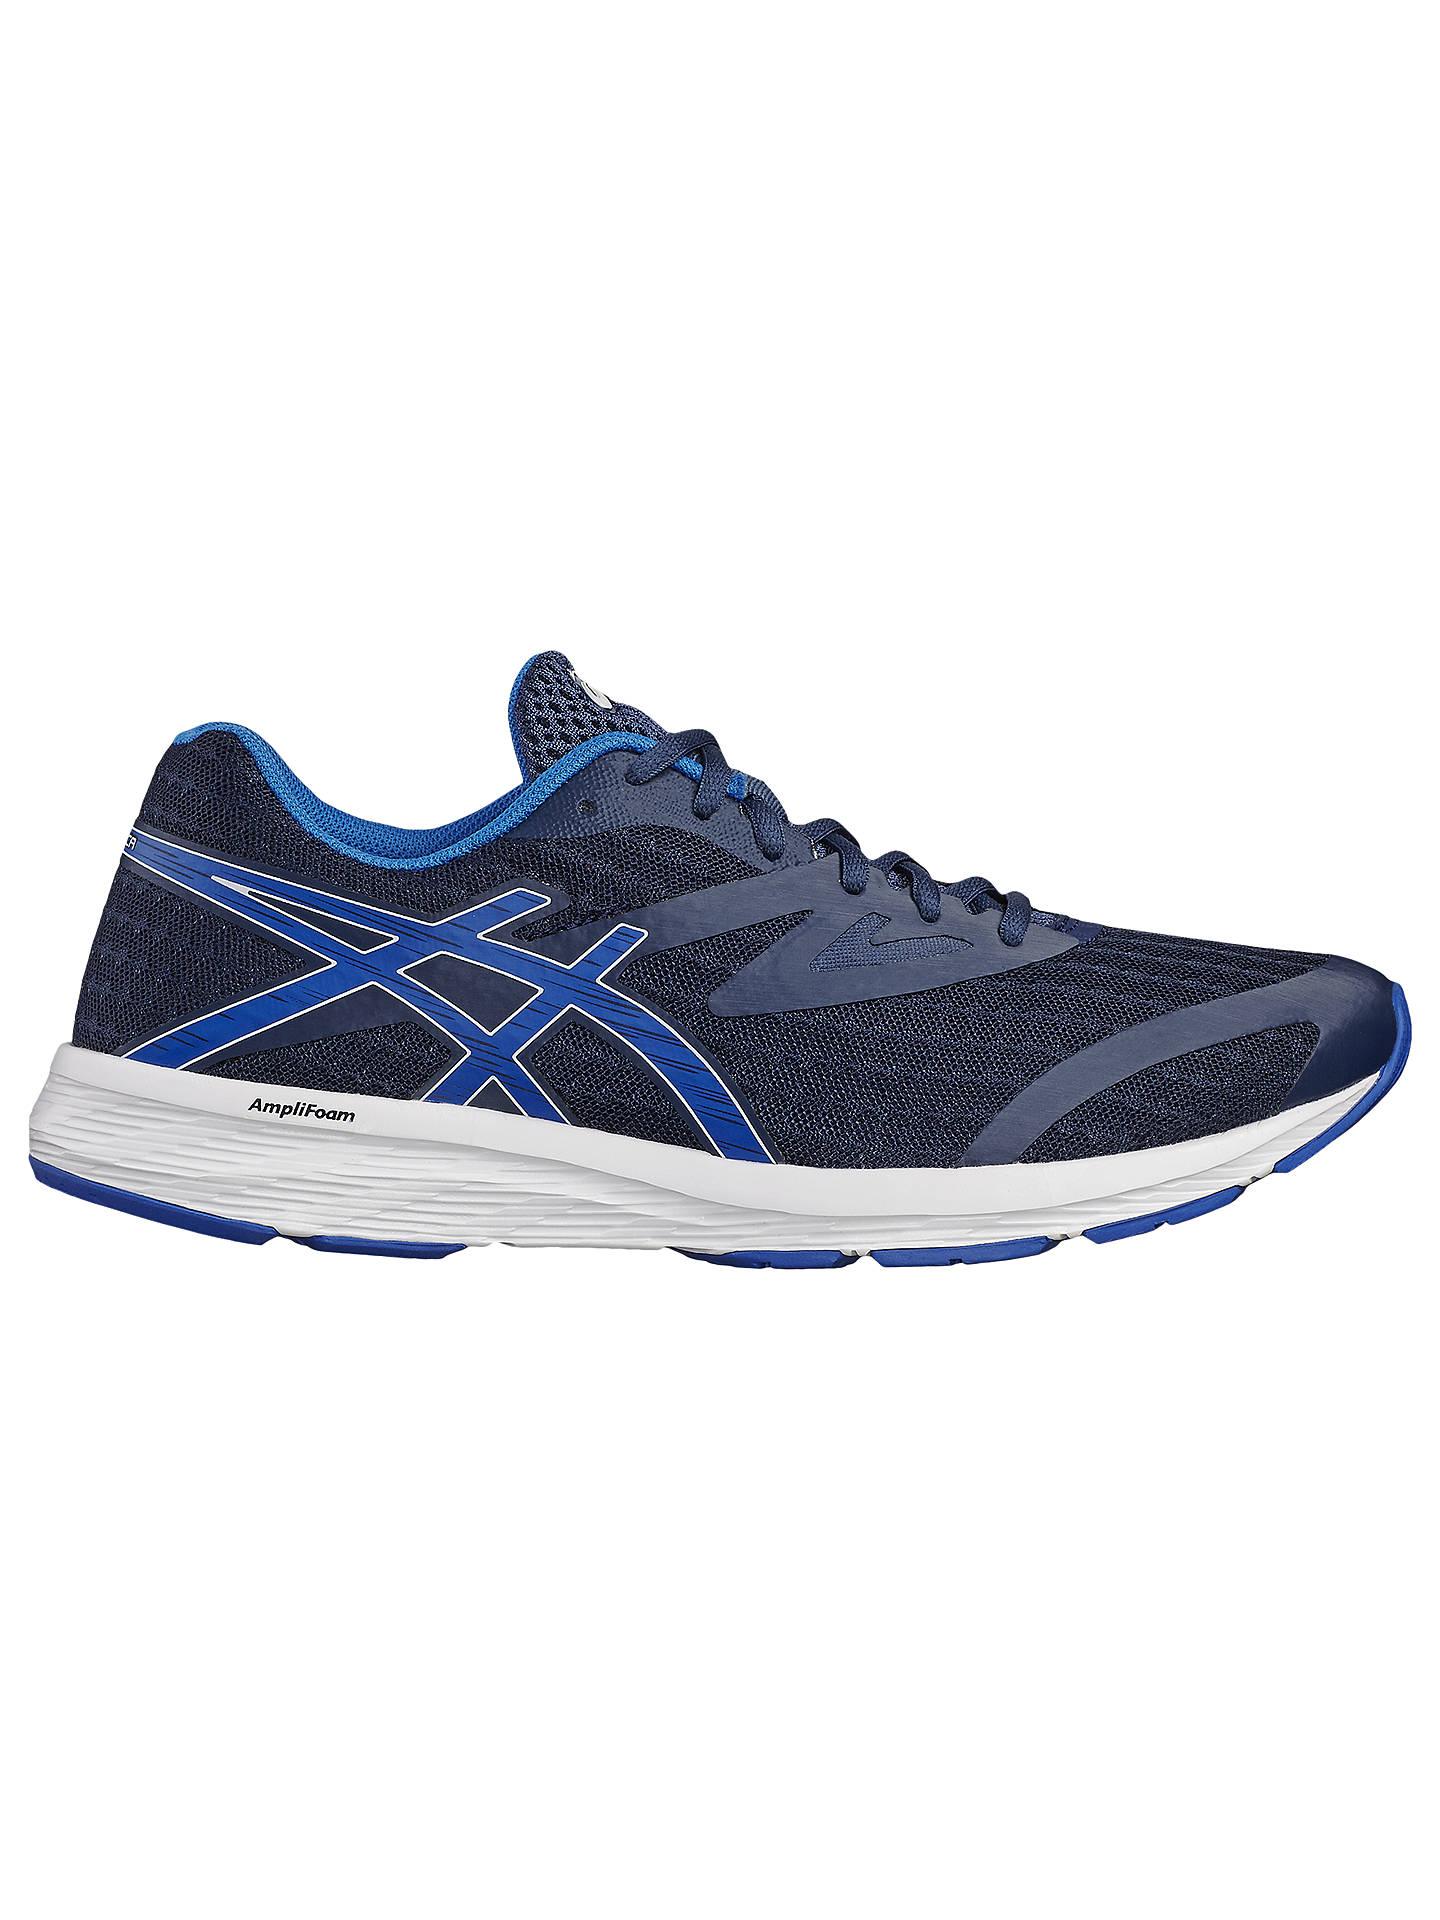 ef8f3c017013 Buy Asics Amplica Men s Running Shoes